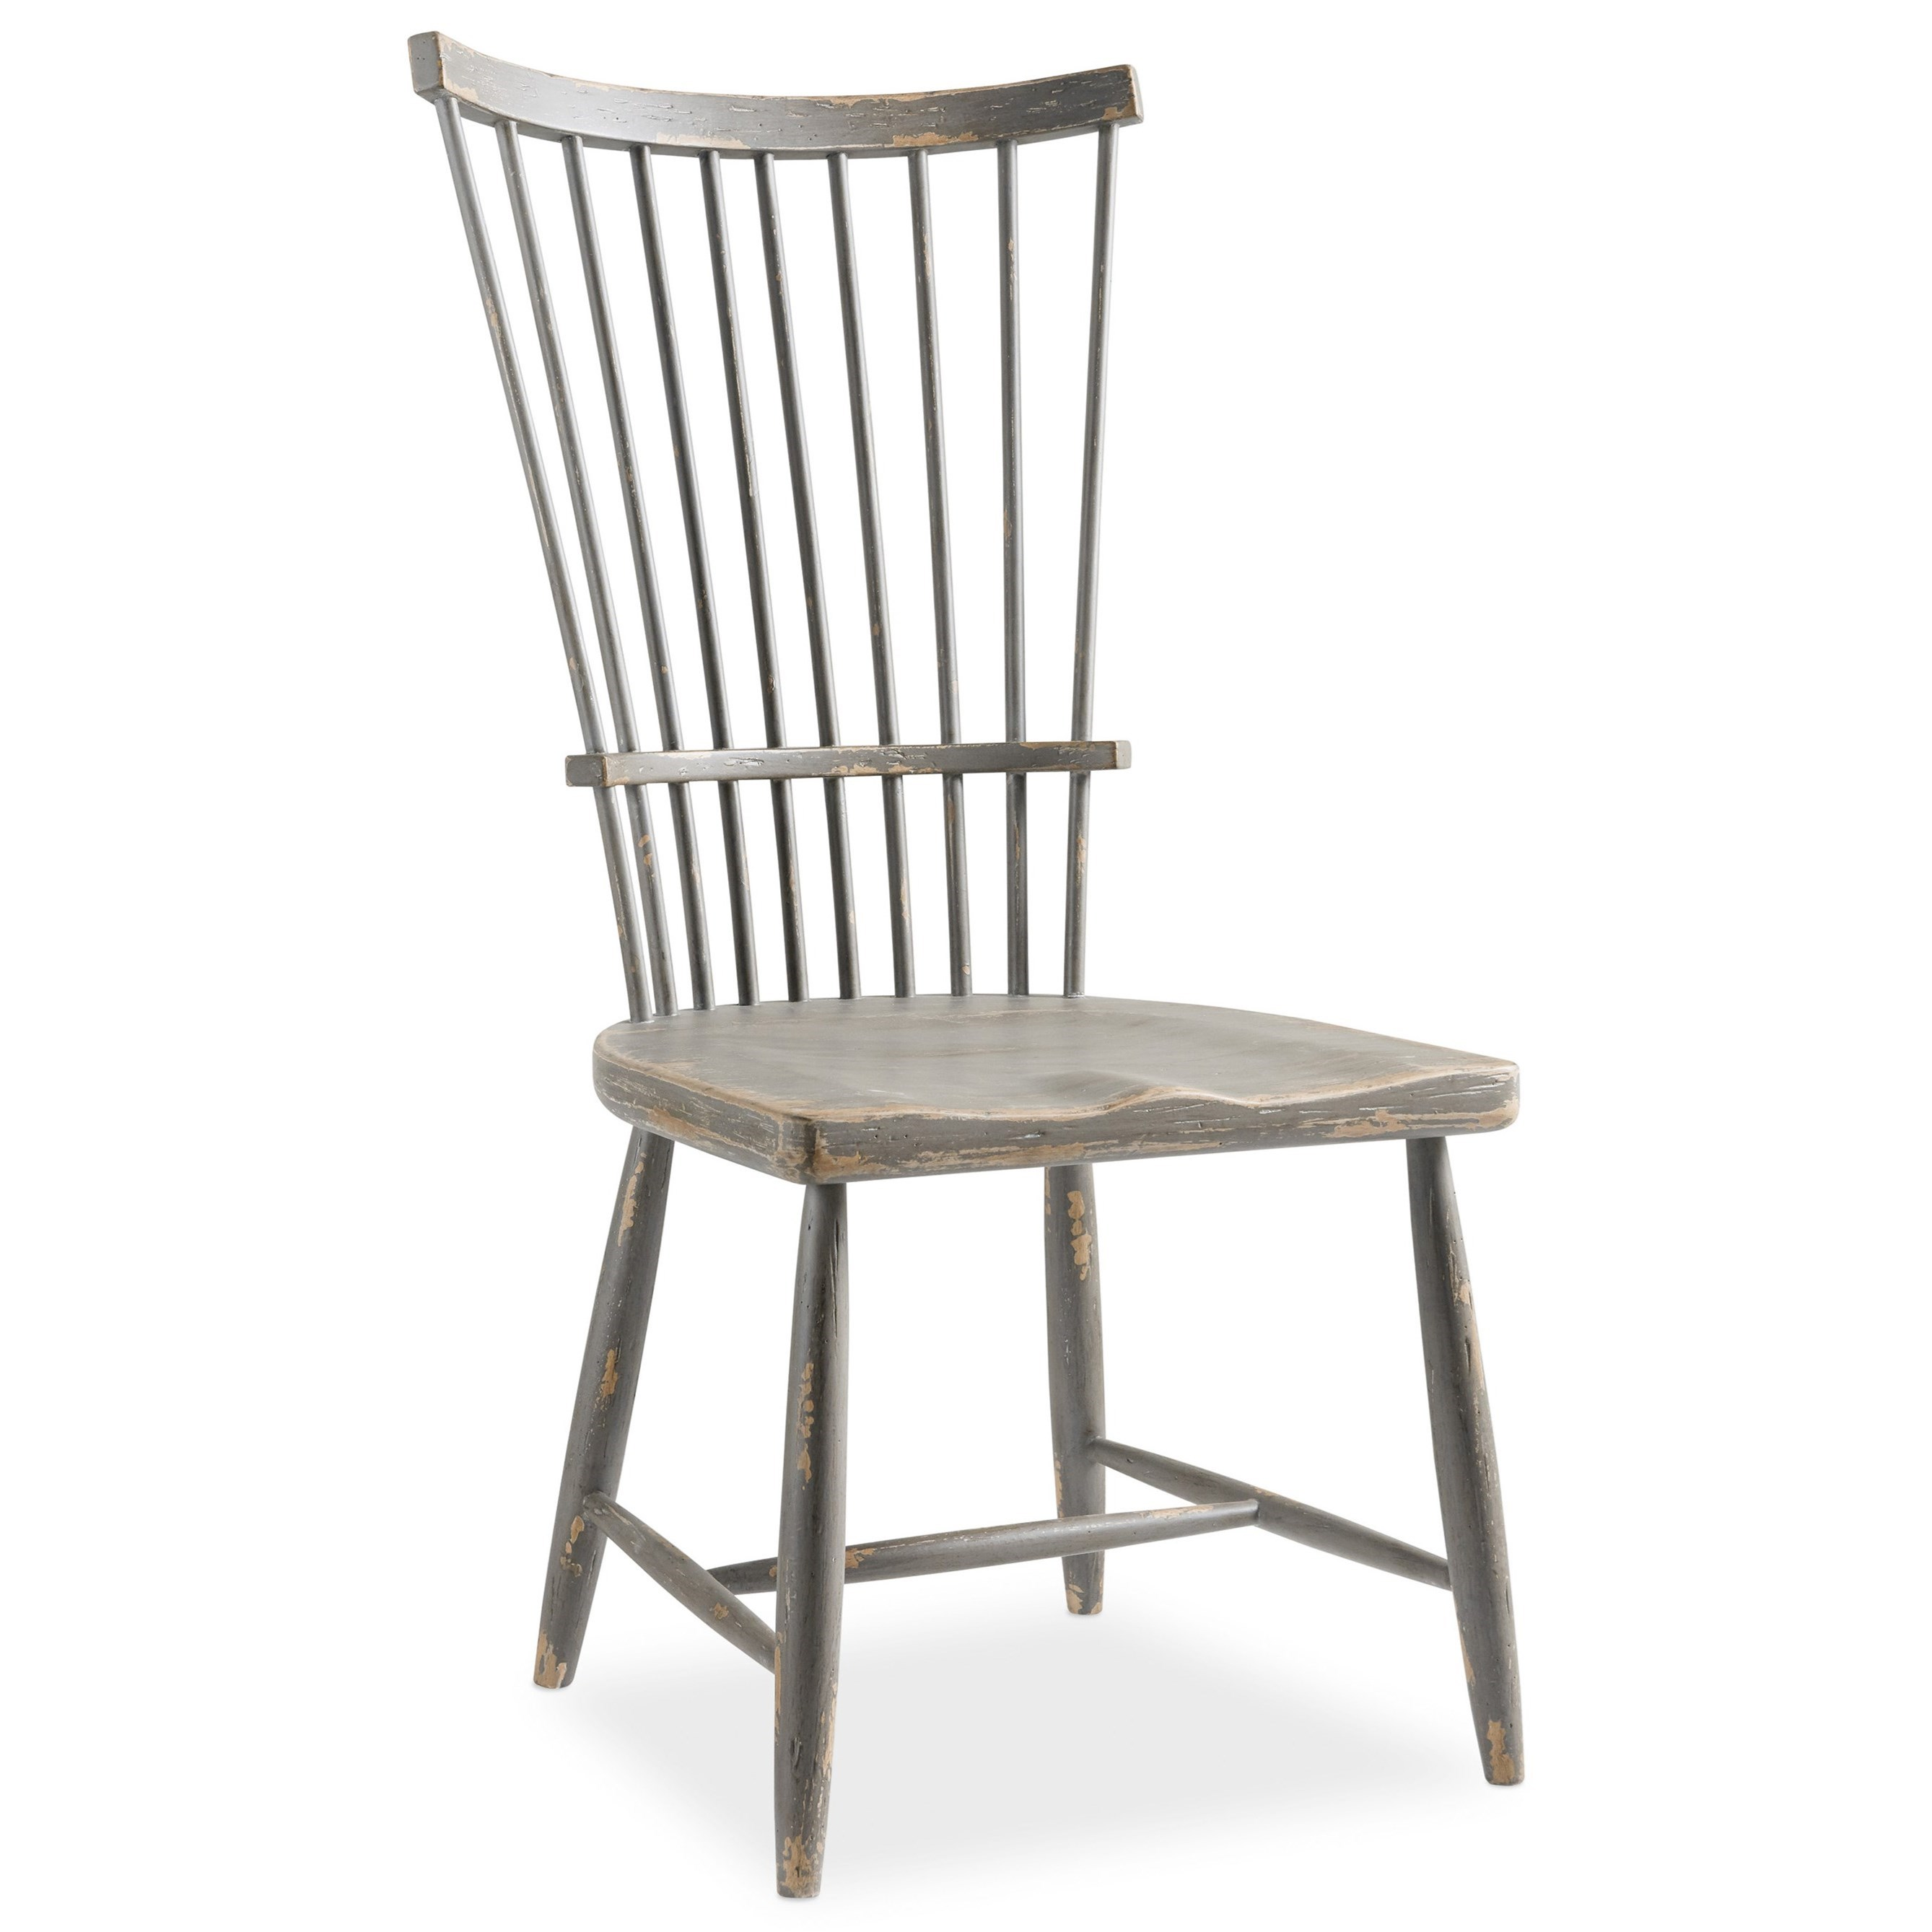 Alfresco Marzano Windsor Side Chair by Hamilton Home at Sprintz Furniture